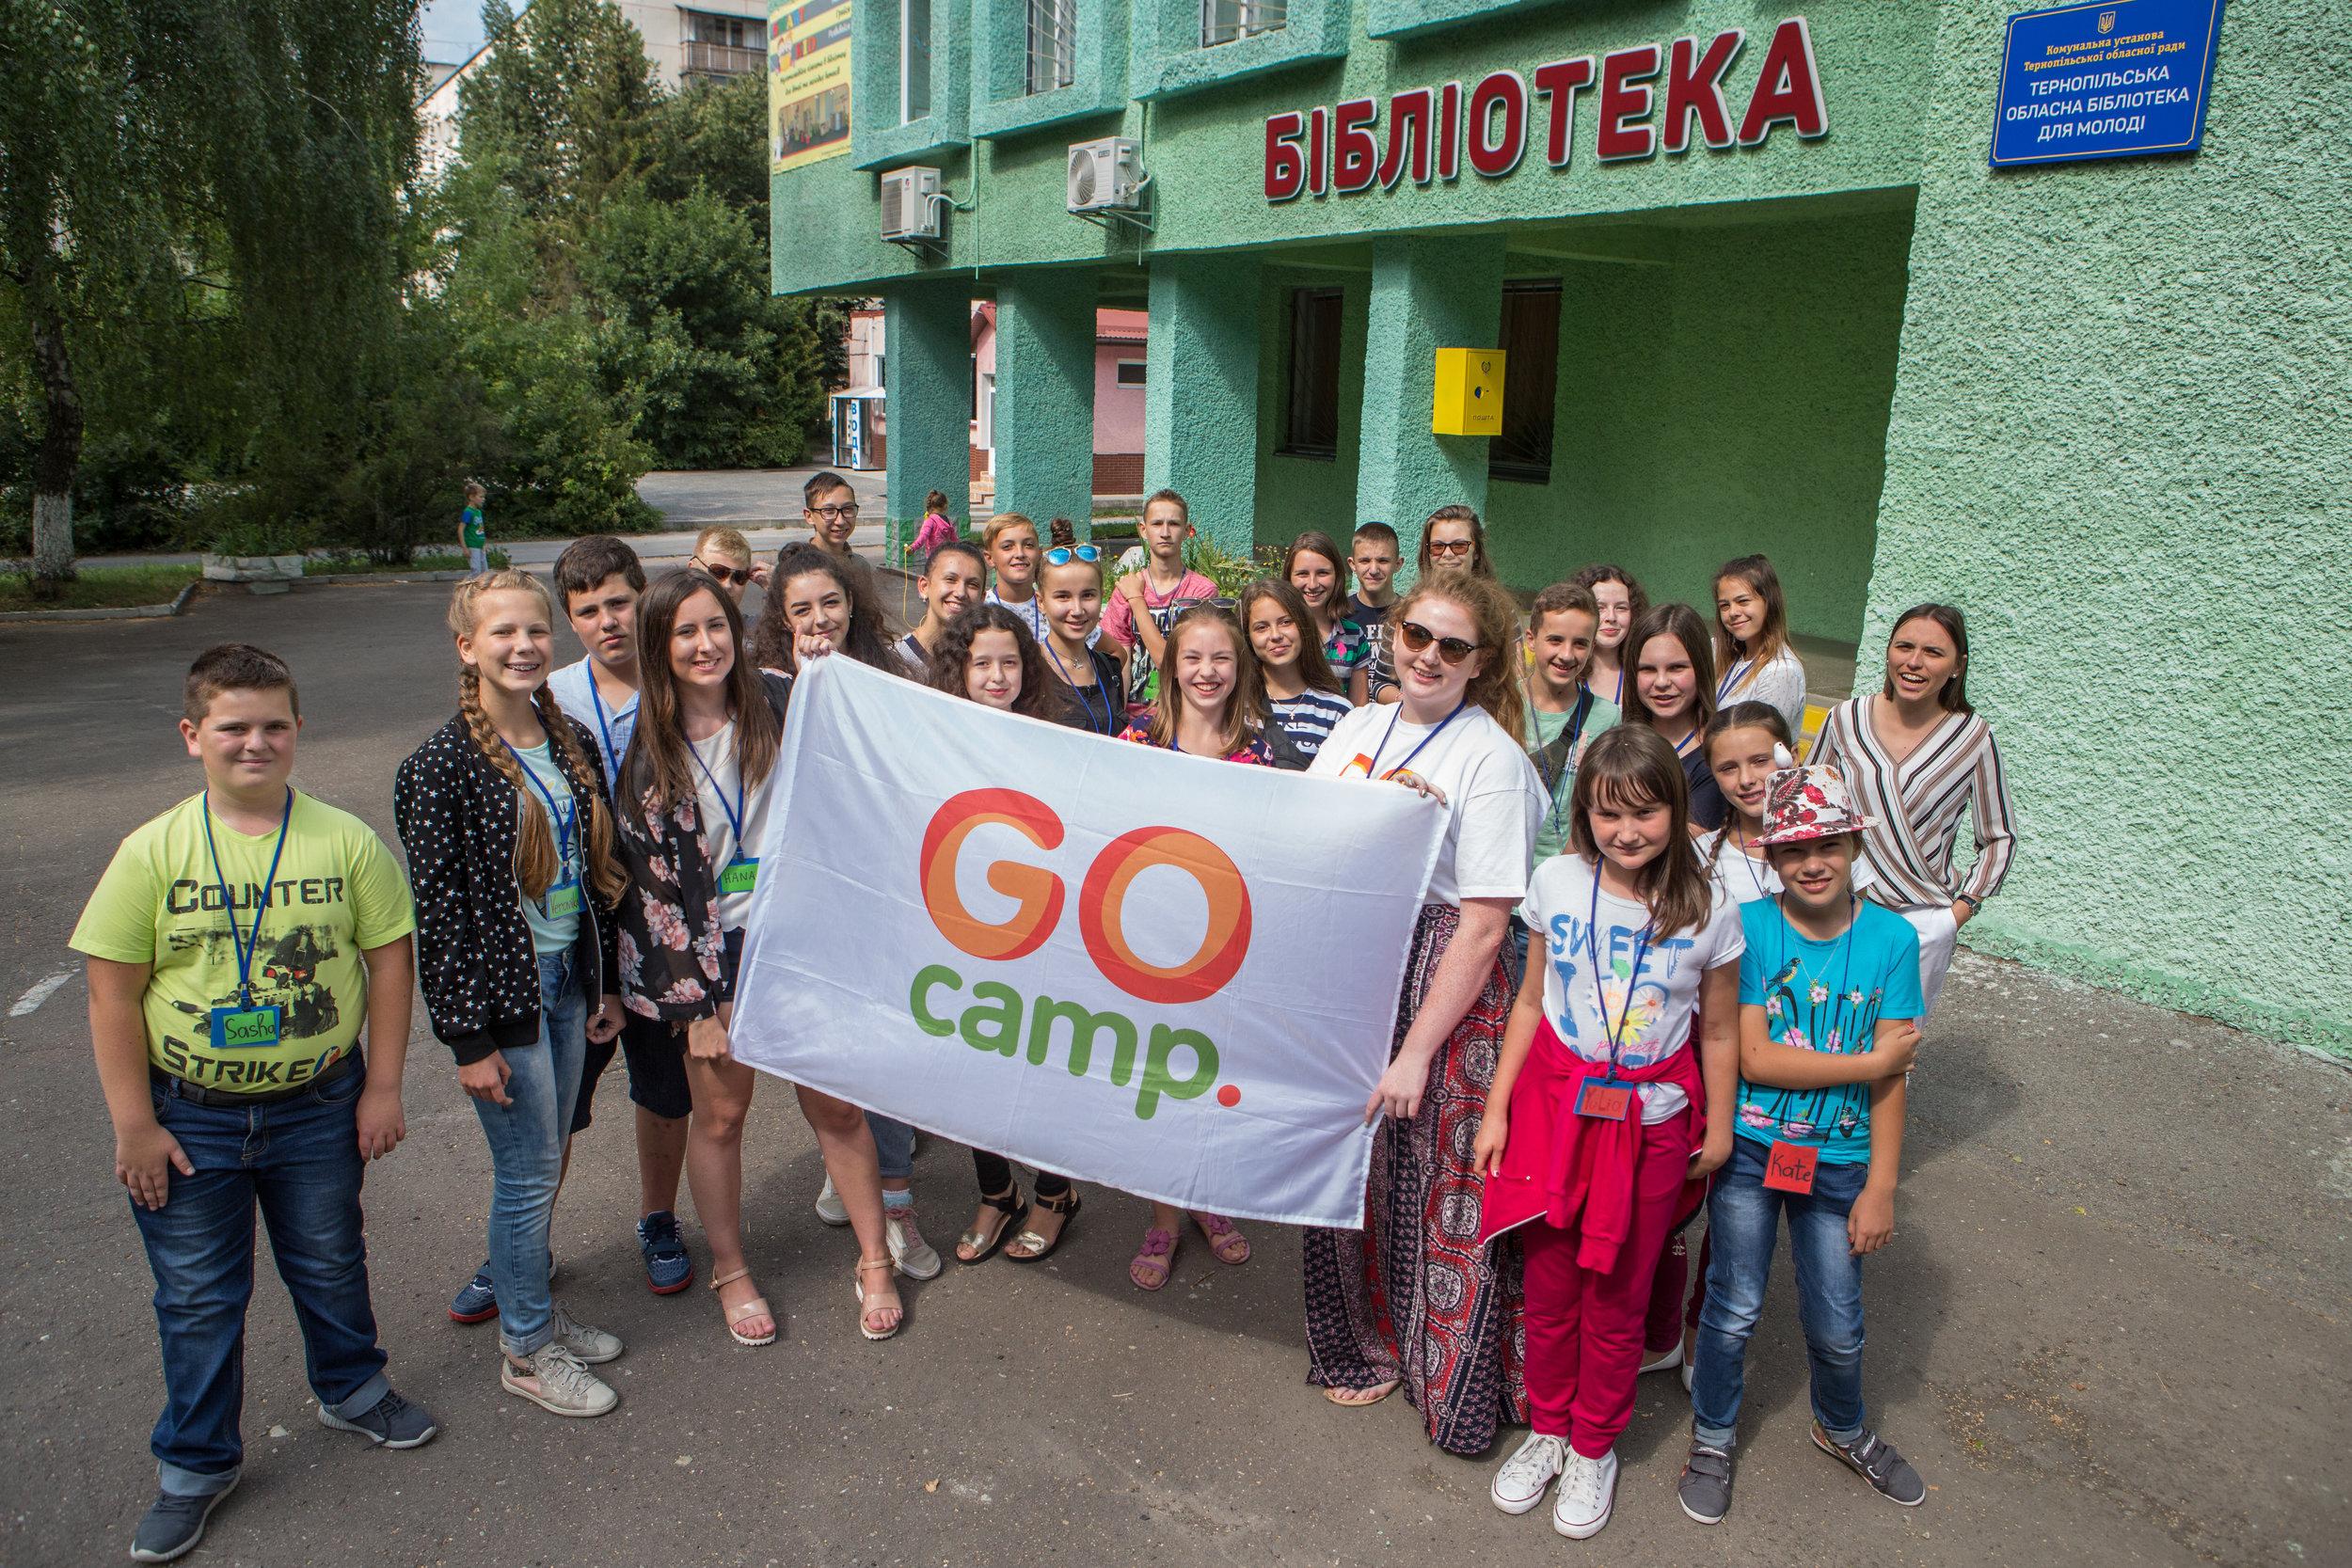 Children & GO camp in Ukraine